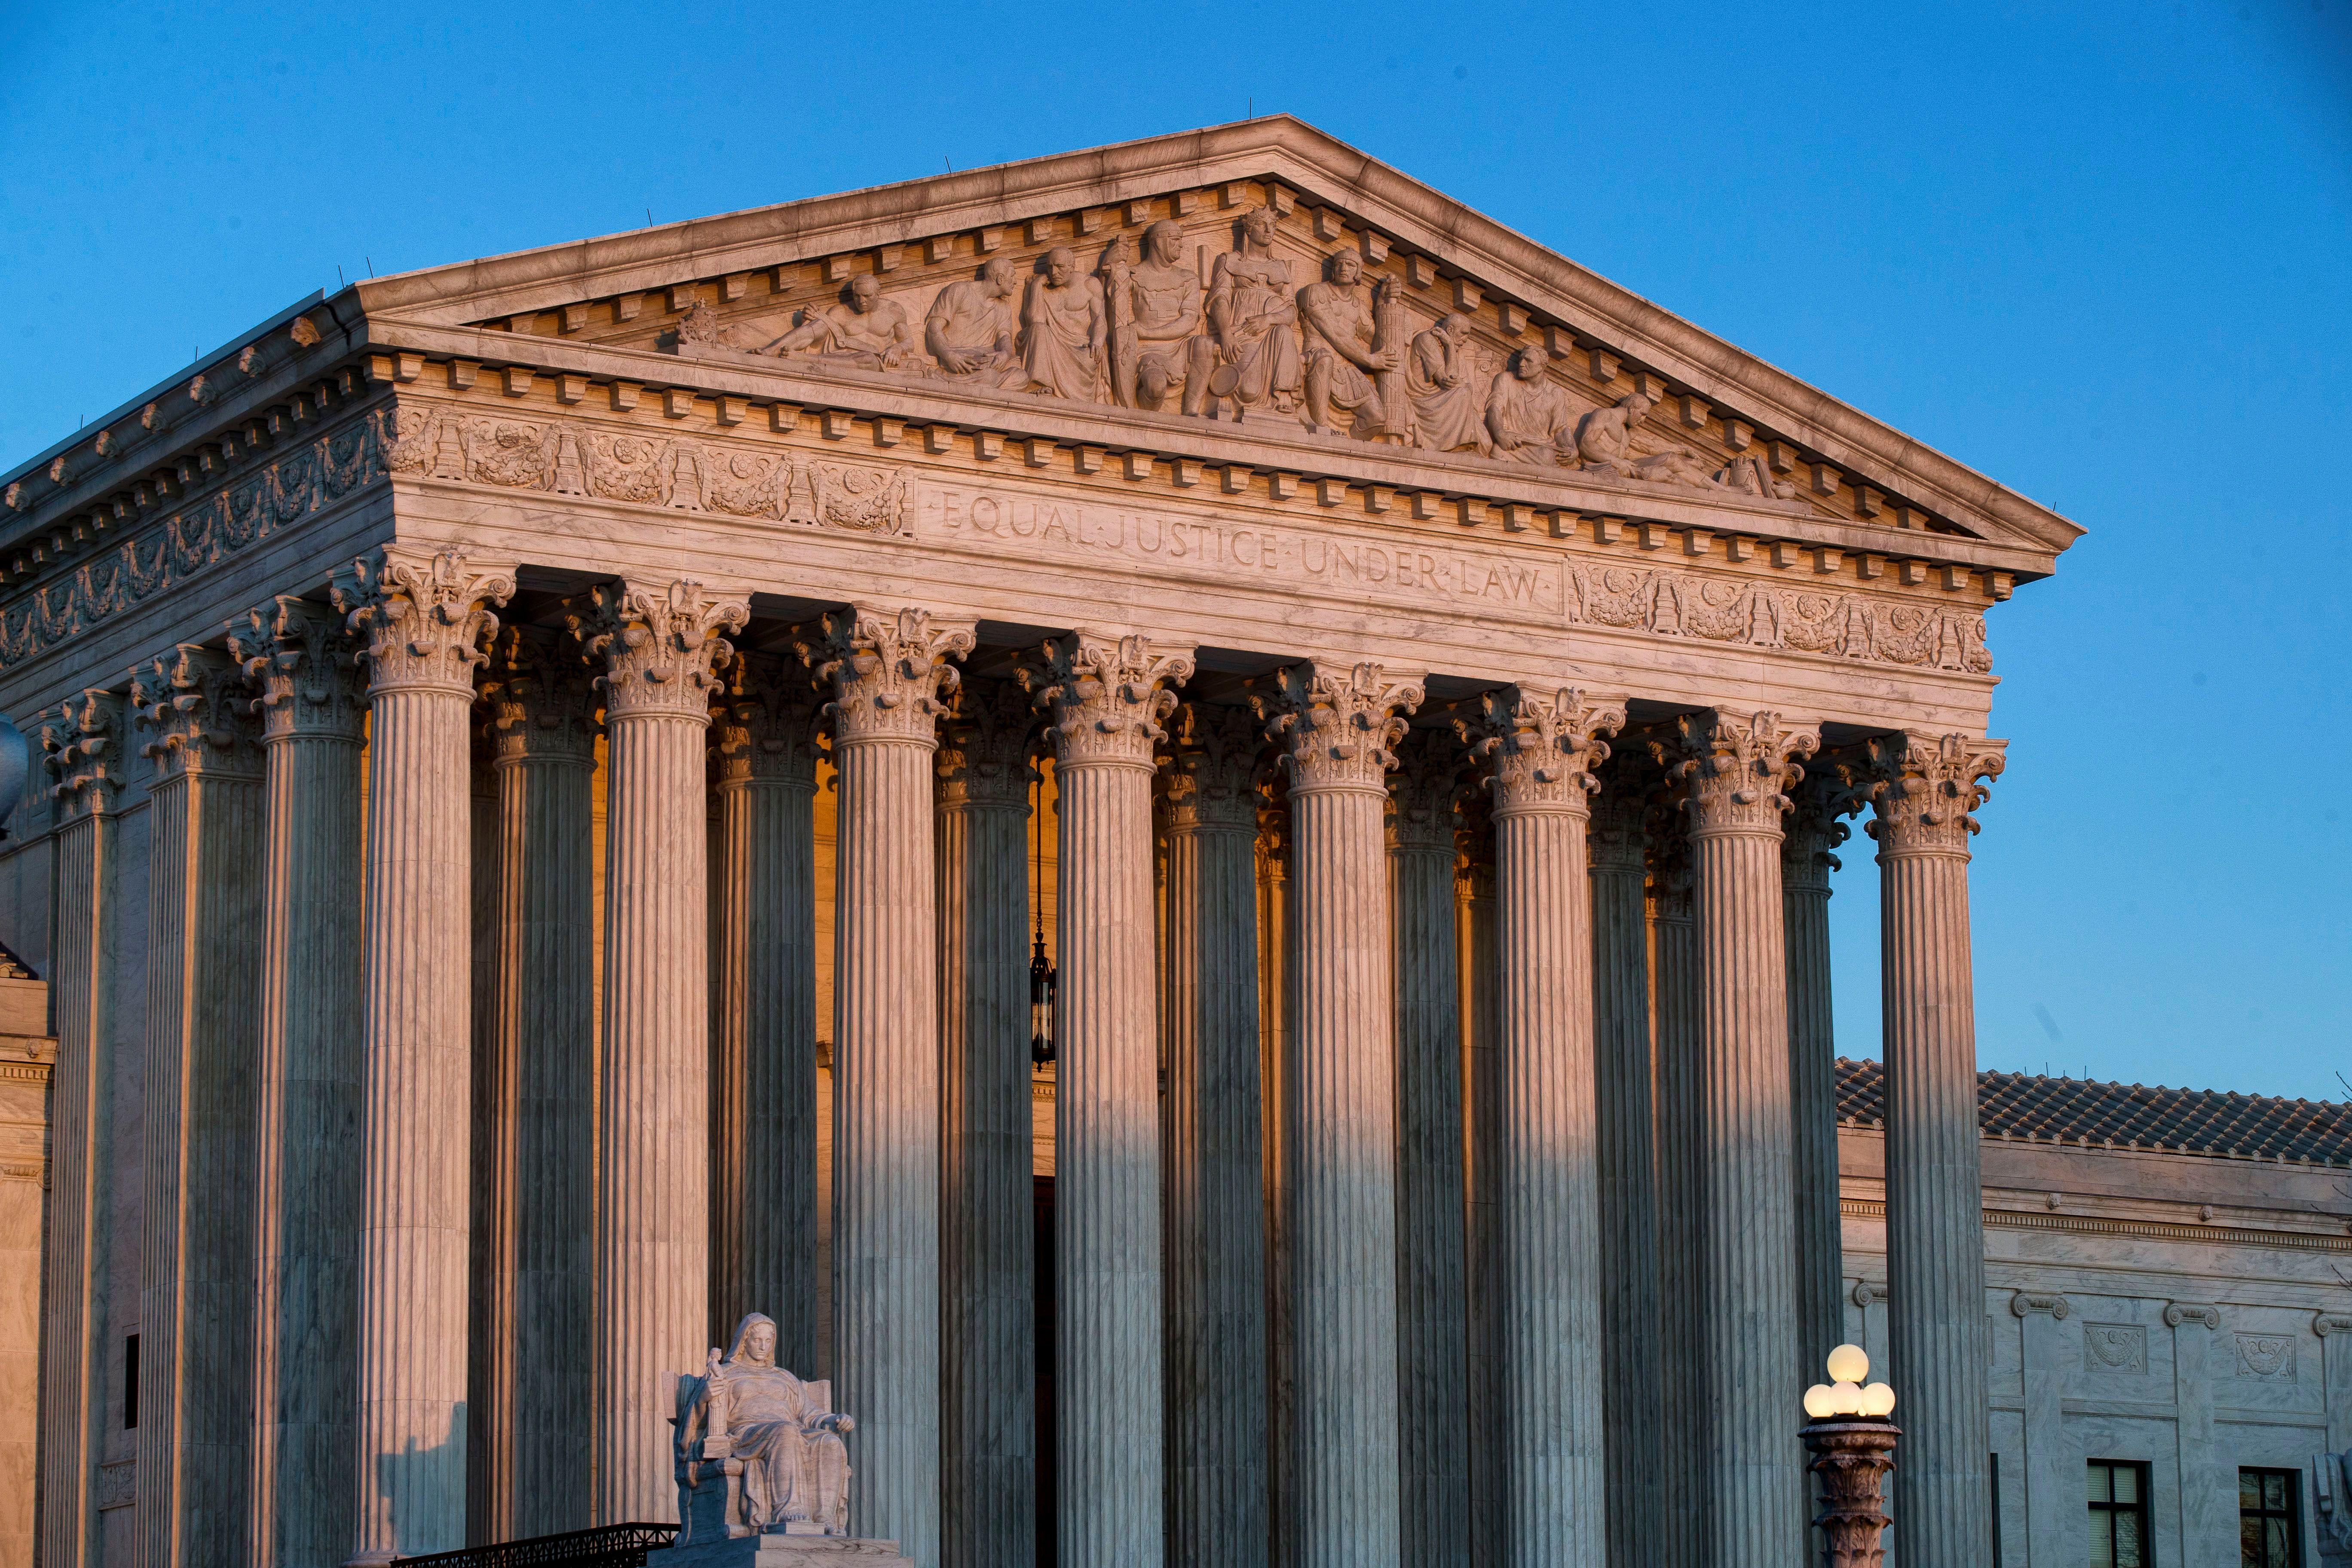 The U.S. Supreme Court is seen at sunset, in WashingtonSupreme Court, Washington, USA - 27 Mar 2019